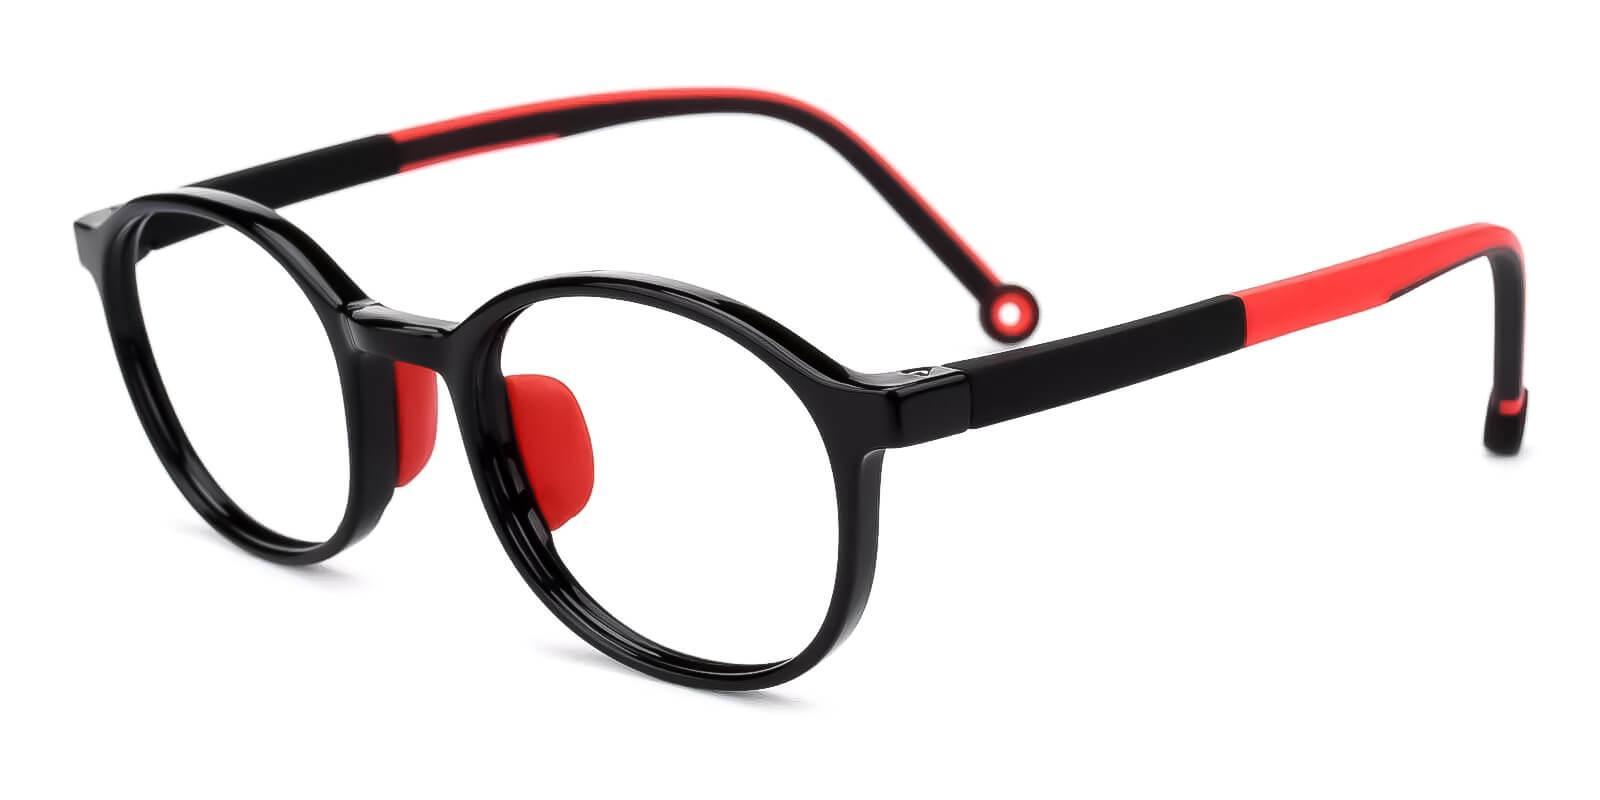 Kids-Exquisite Black TR Eyeglasses , Fashion , UniversalBridgeFit Frames from ABBE Glasses